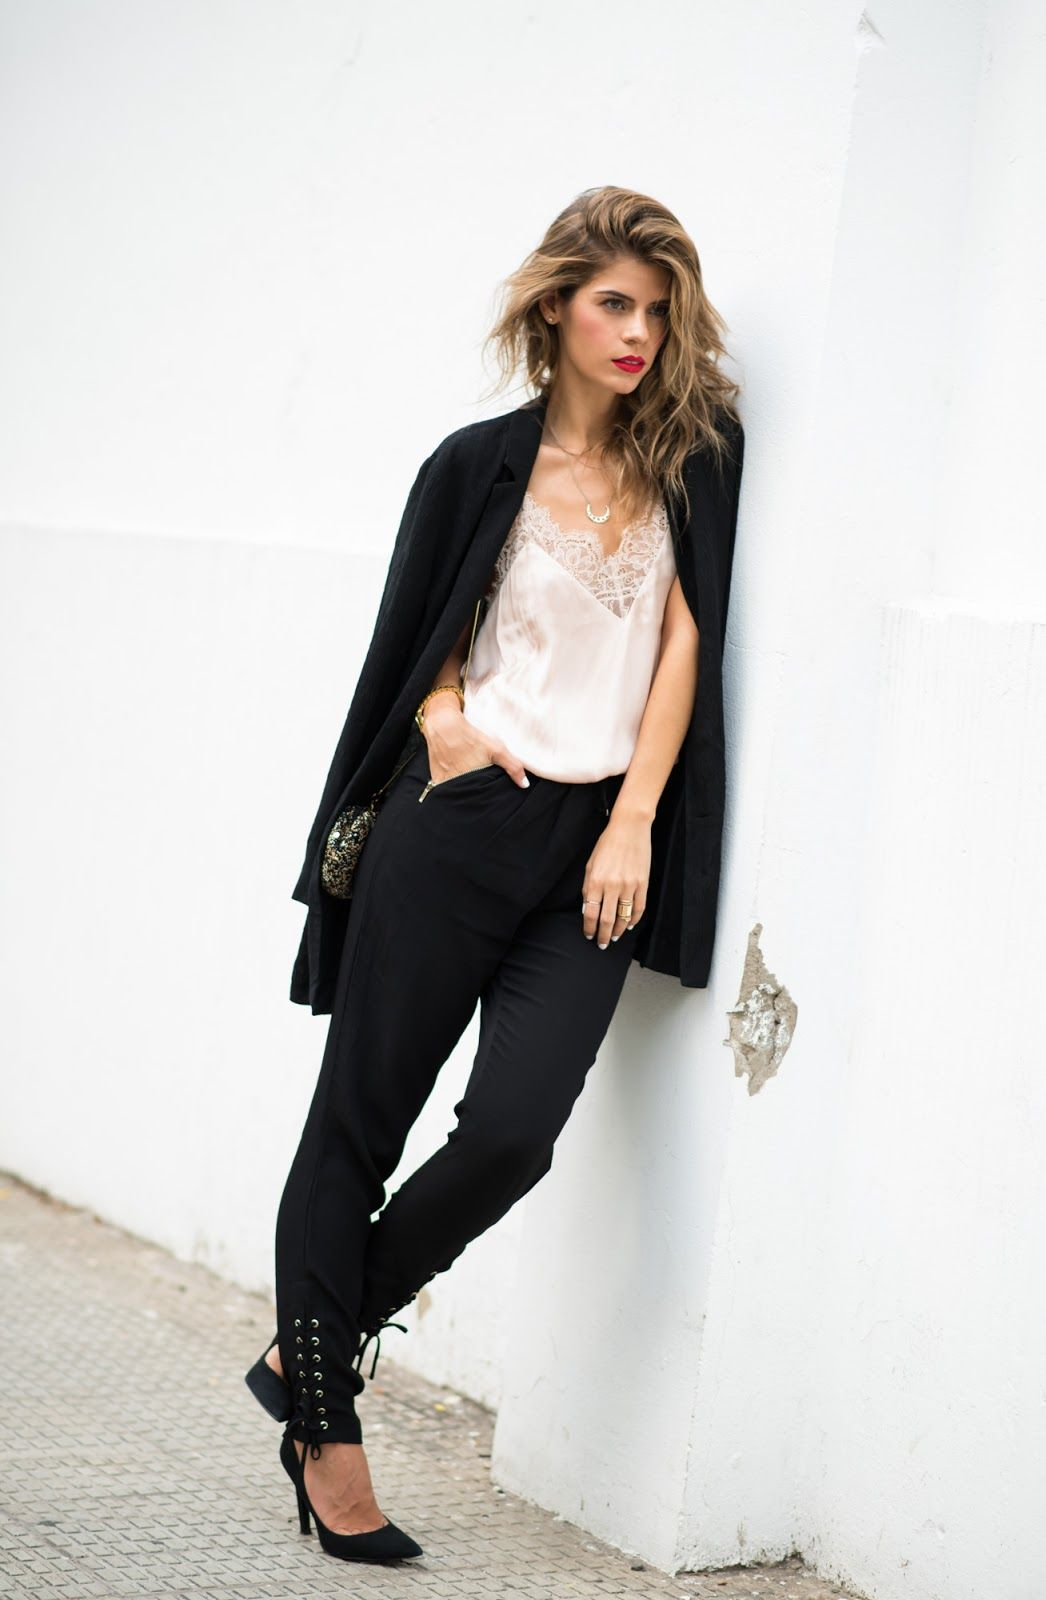 Ms Treinta - Fashion blogger - Blog de moda y tendencias by Alba.: Sunday night